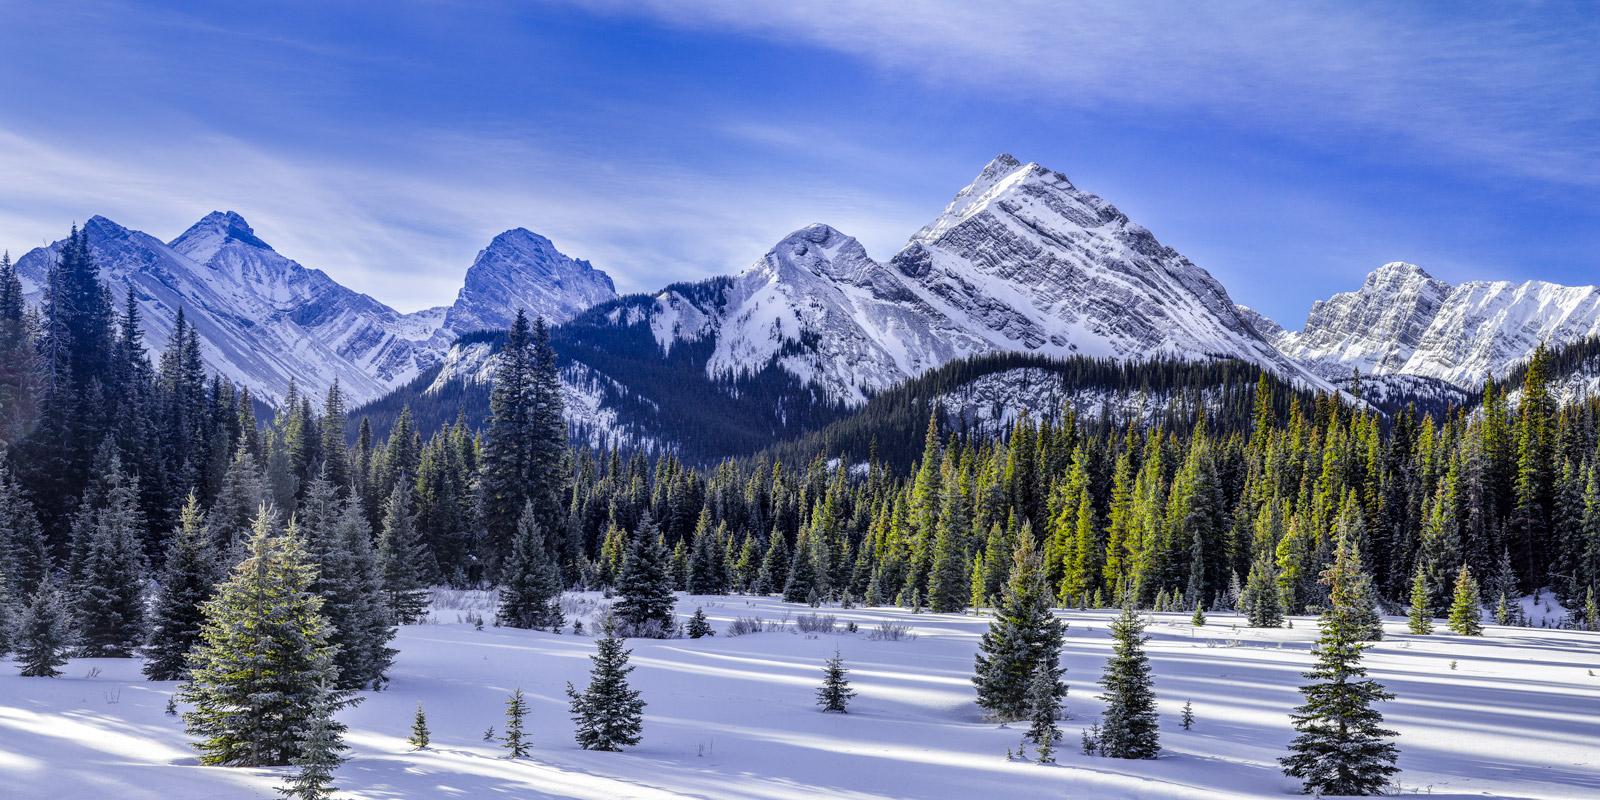 Alberta, Canada, Canadian, Rockies, Mountain, Winter, Shadows, limited edition, photograph, fine art, landscape, photo